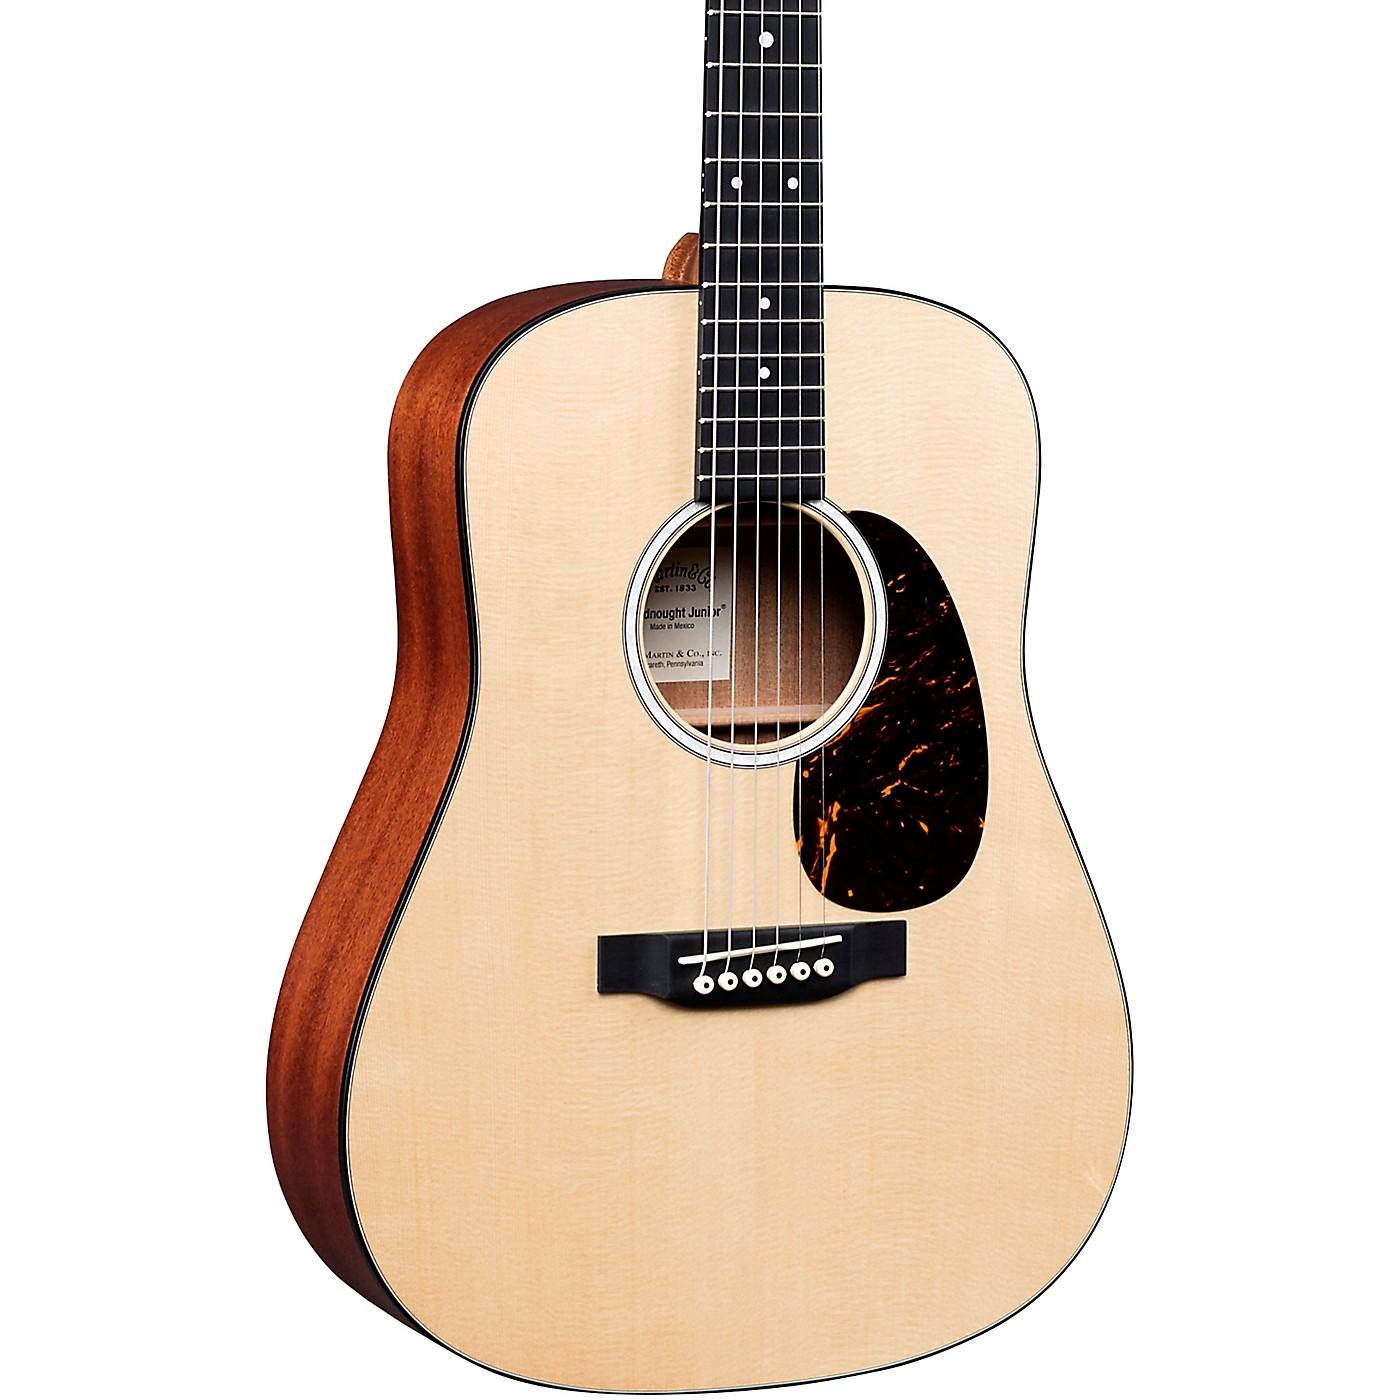 Martin DJr-10E Sitka Top Dreadnought Junior Acoustic-Electric Guitar thumbnail